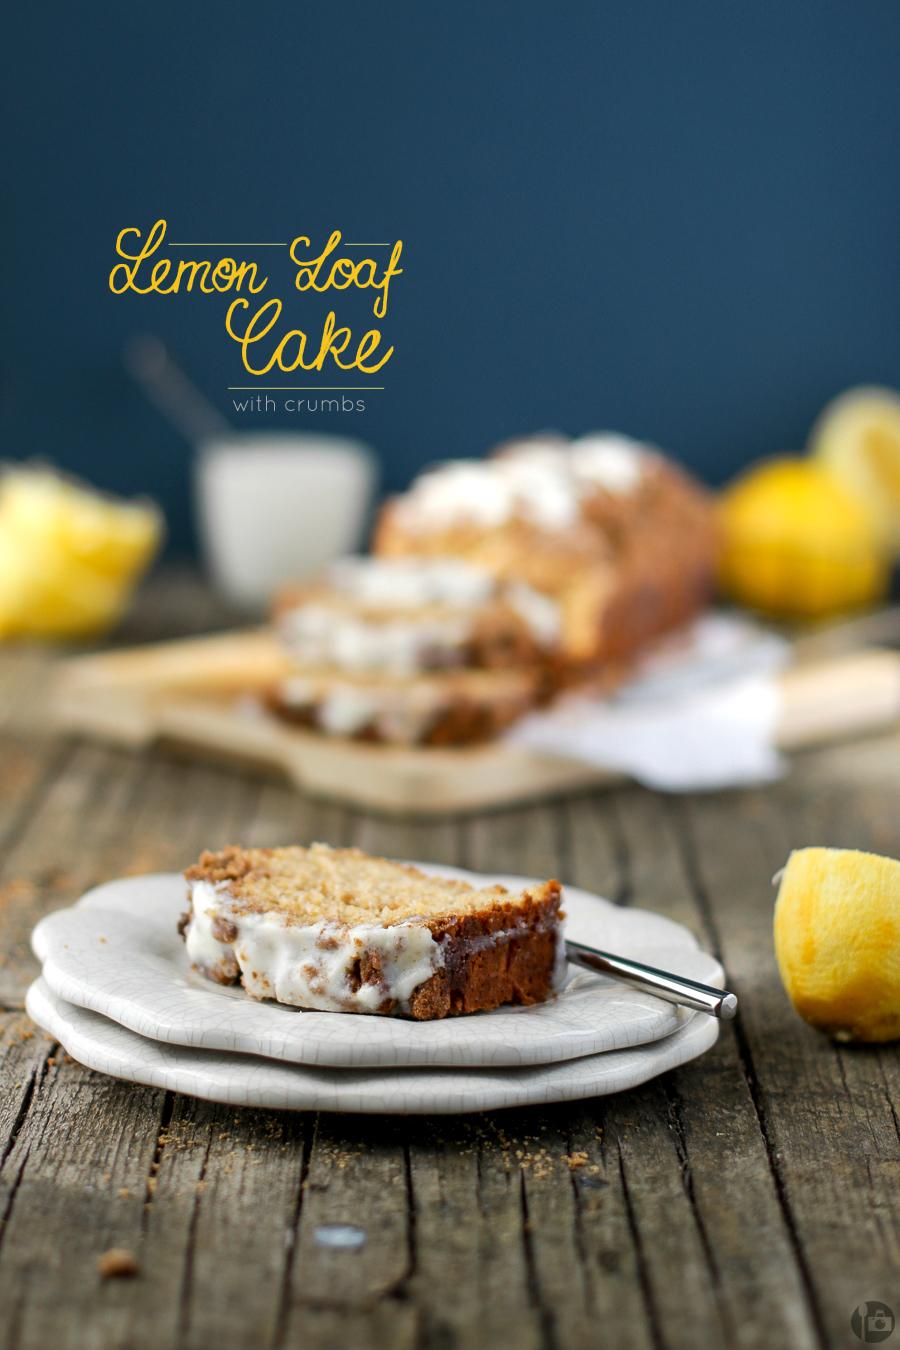 Lemon Loaf Cake with Crumbs